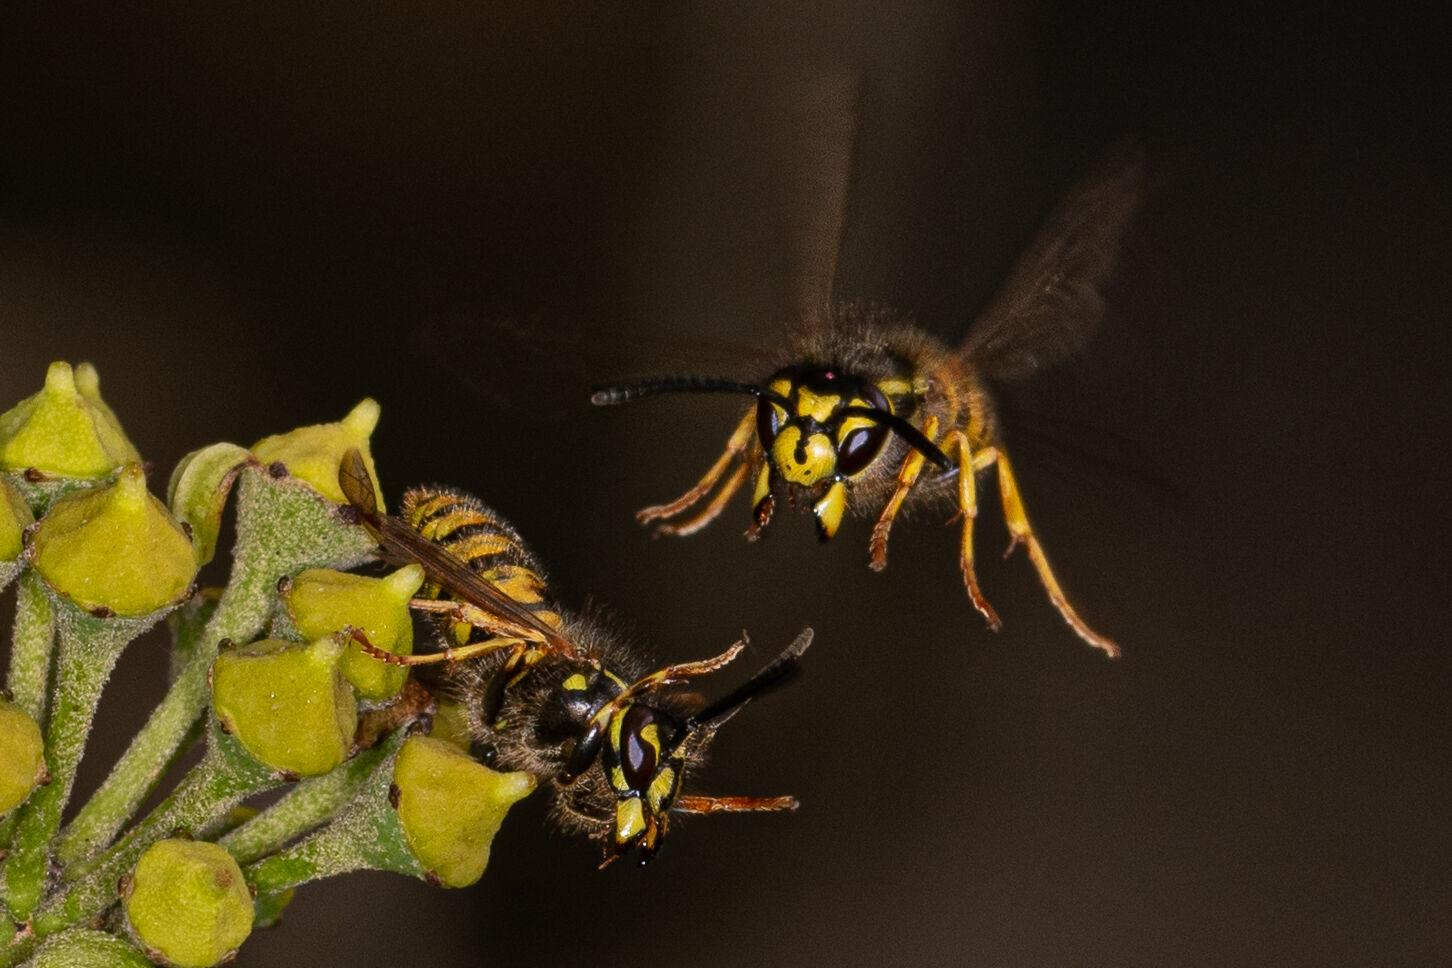 Third - Wasp Attack - Allan Metcalfe